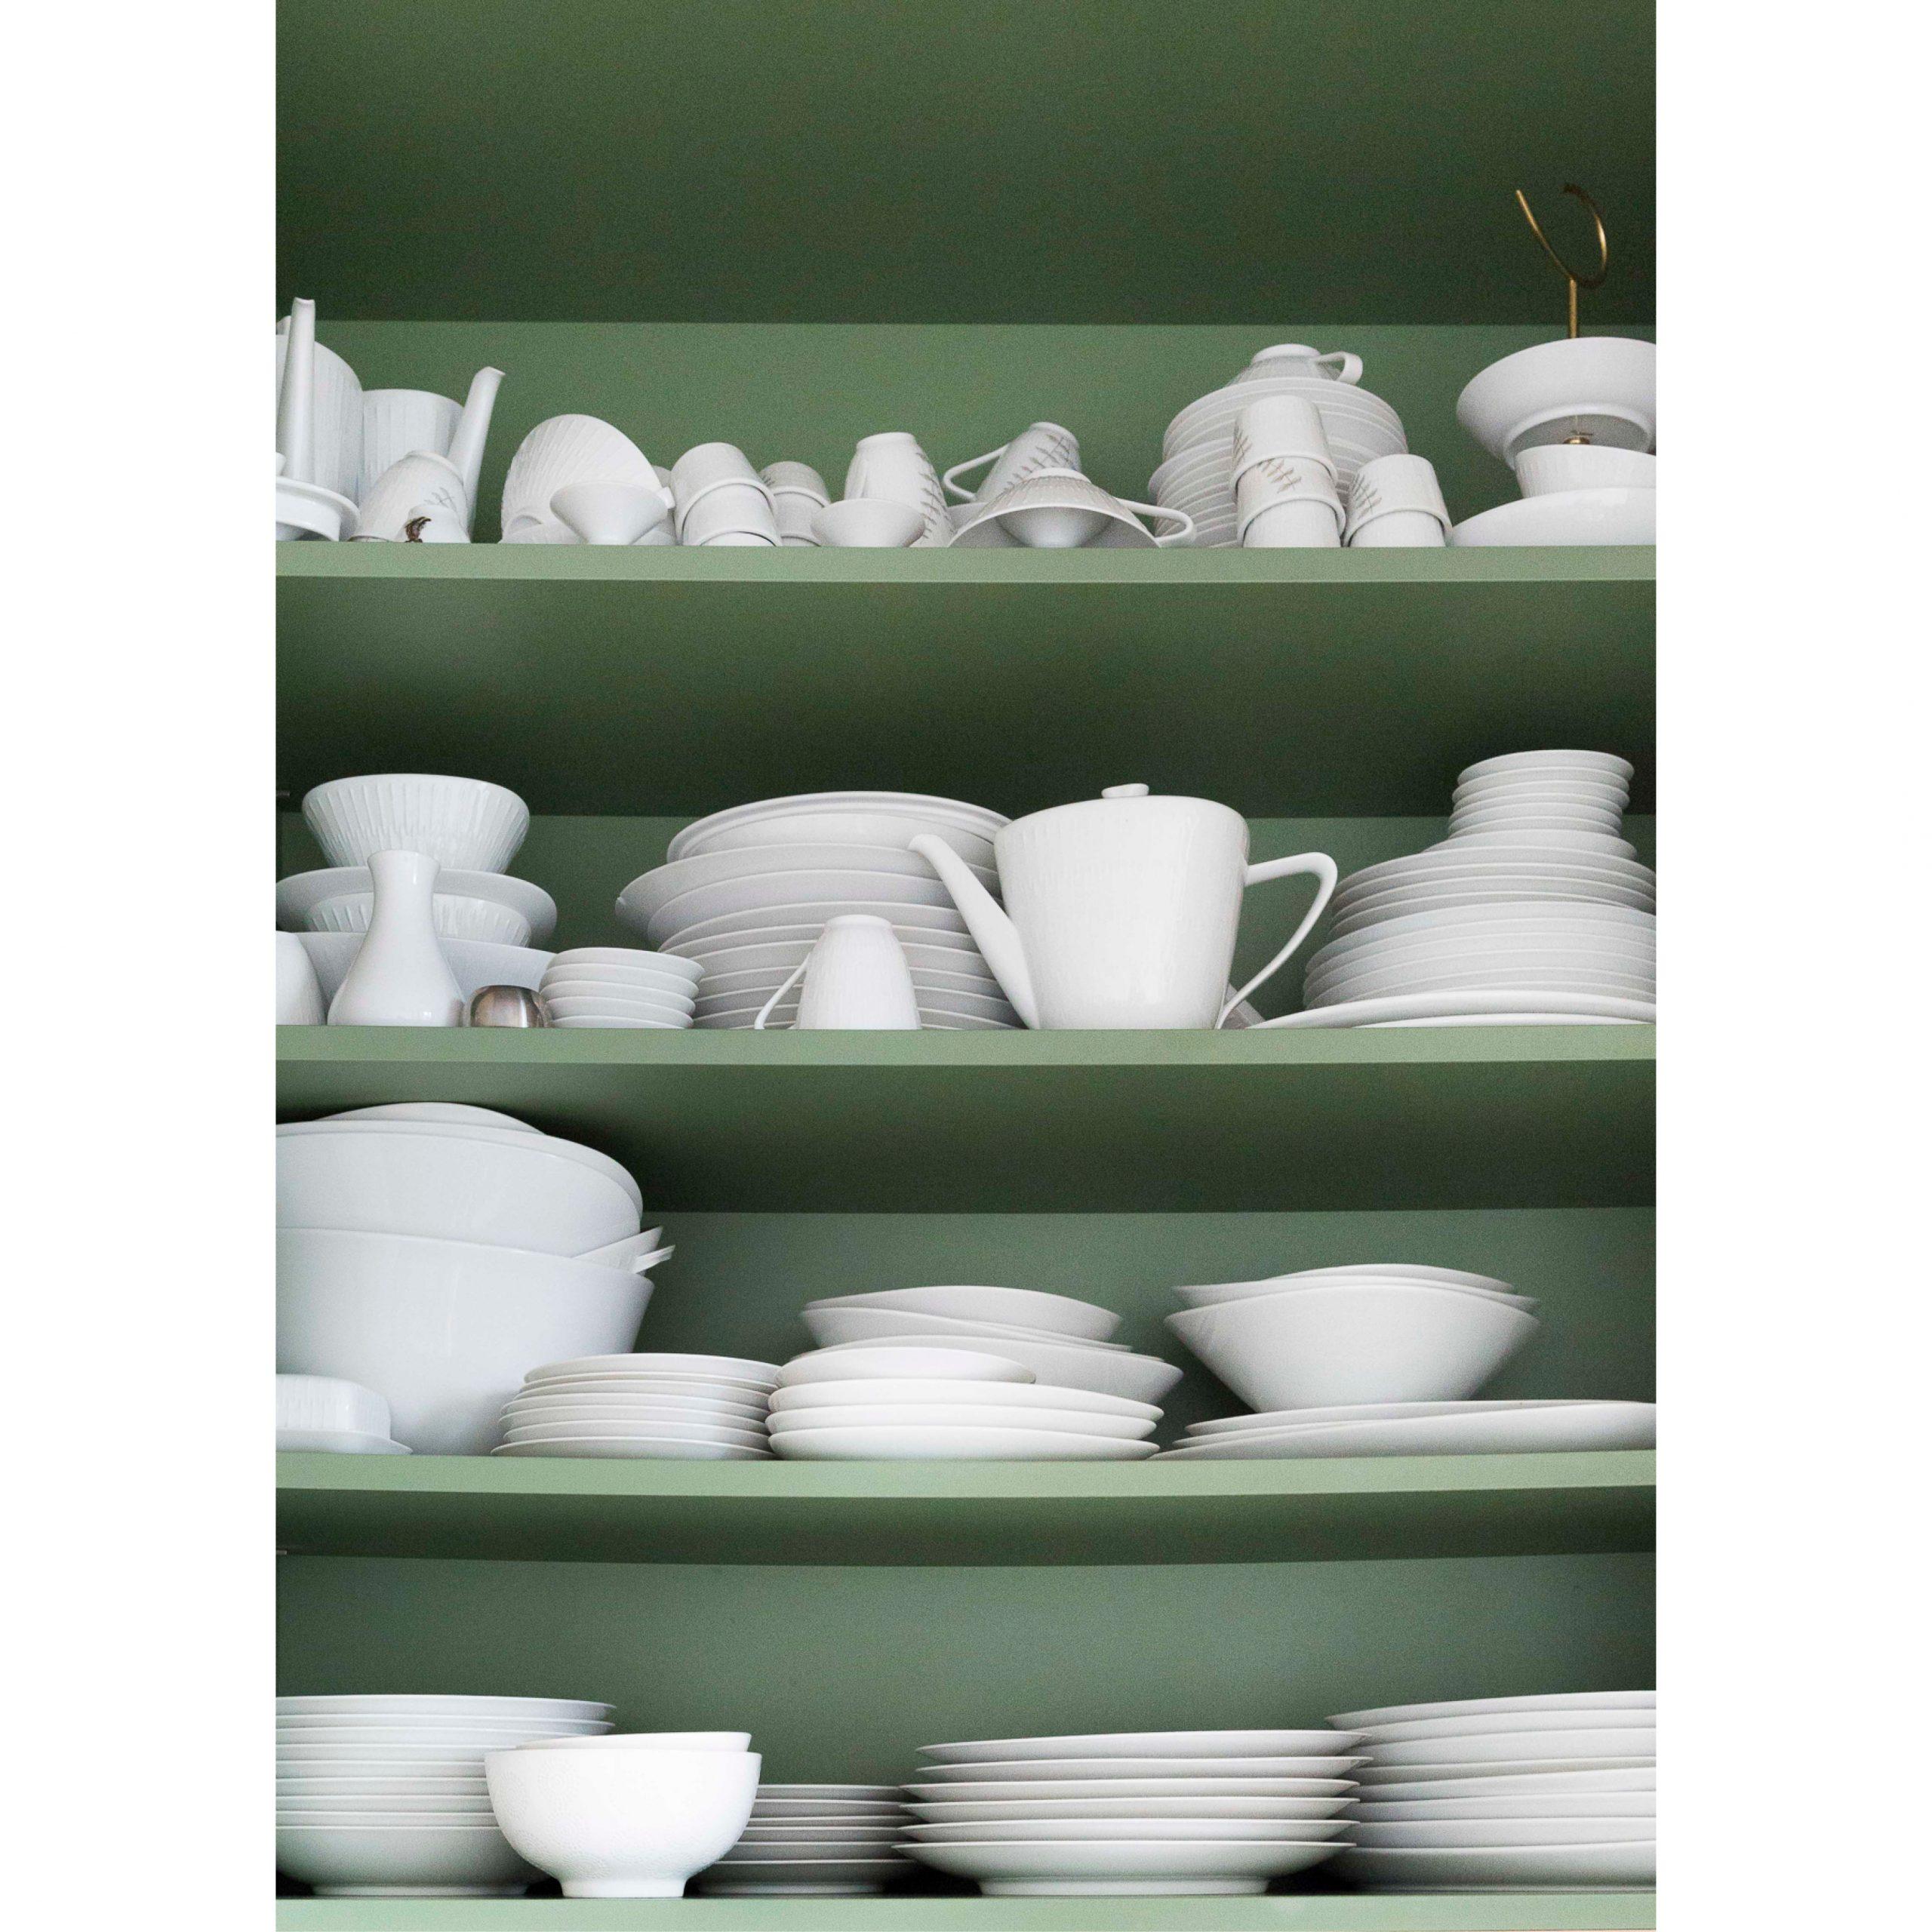 Ester Bruzkus Interior Kitchen ©Caroline Prange_6